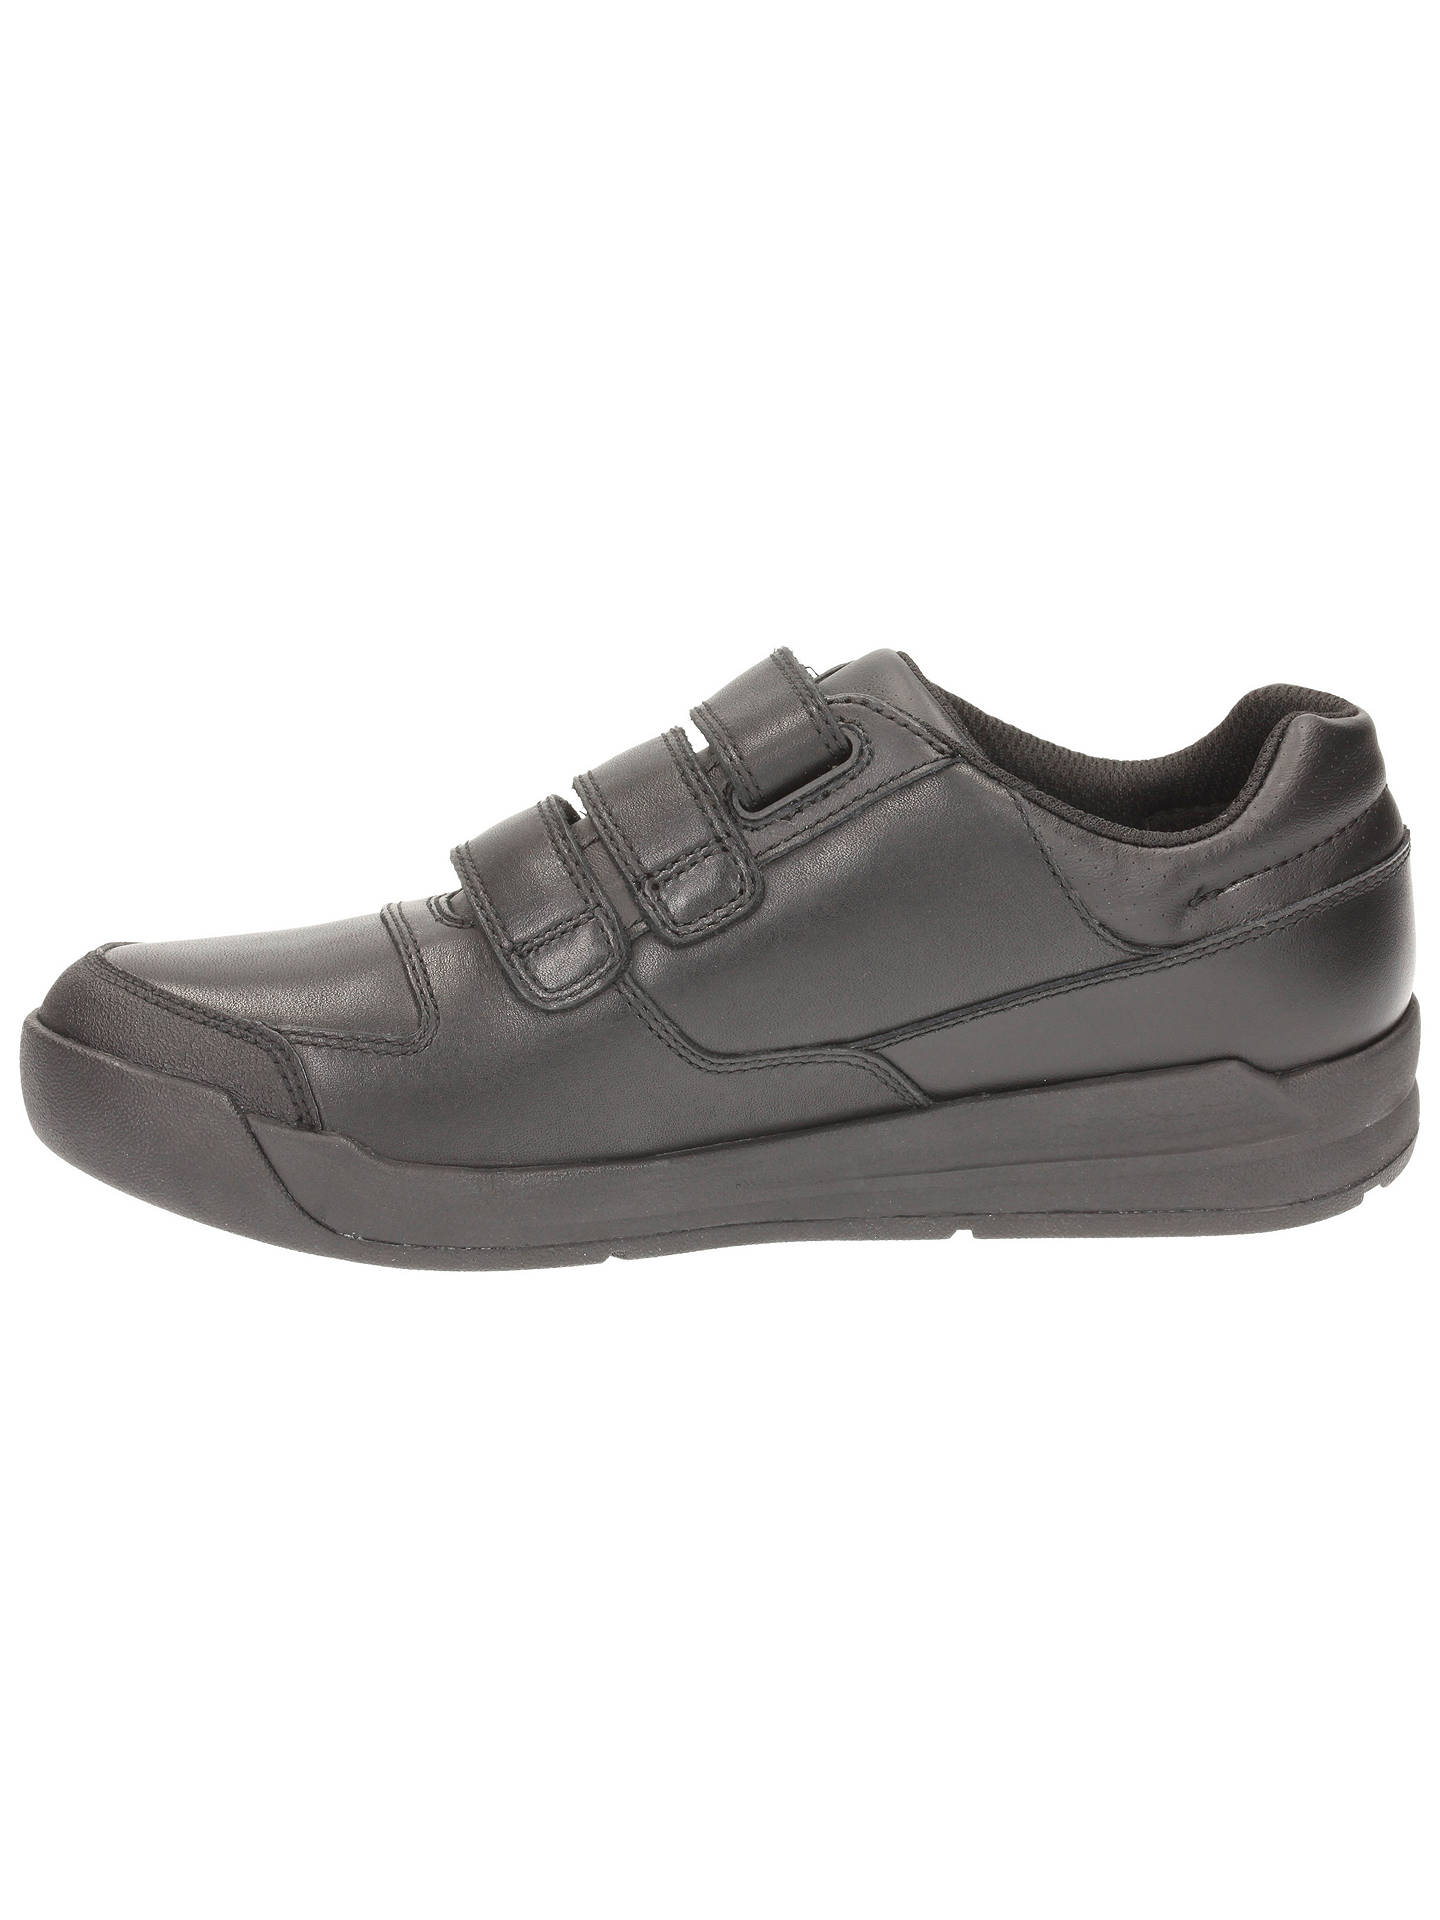 Boys Clarks Flare Lite School Shoes